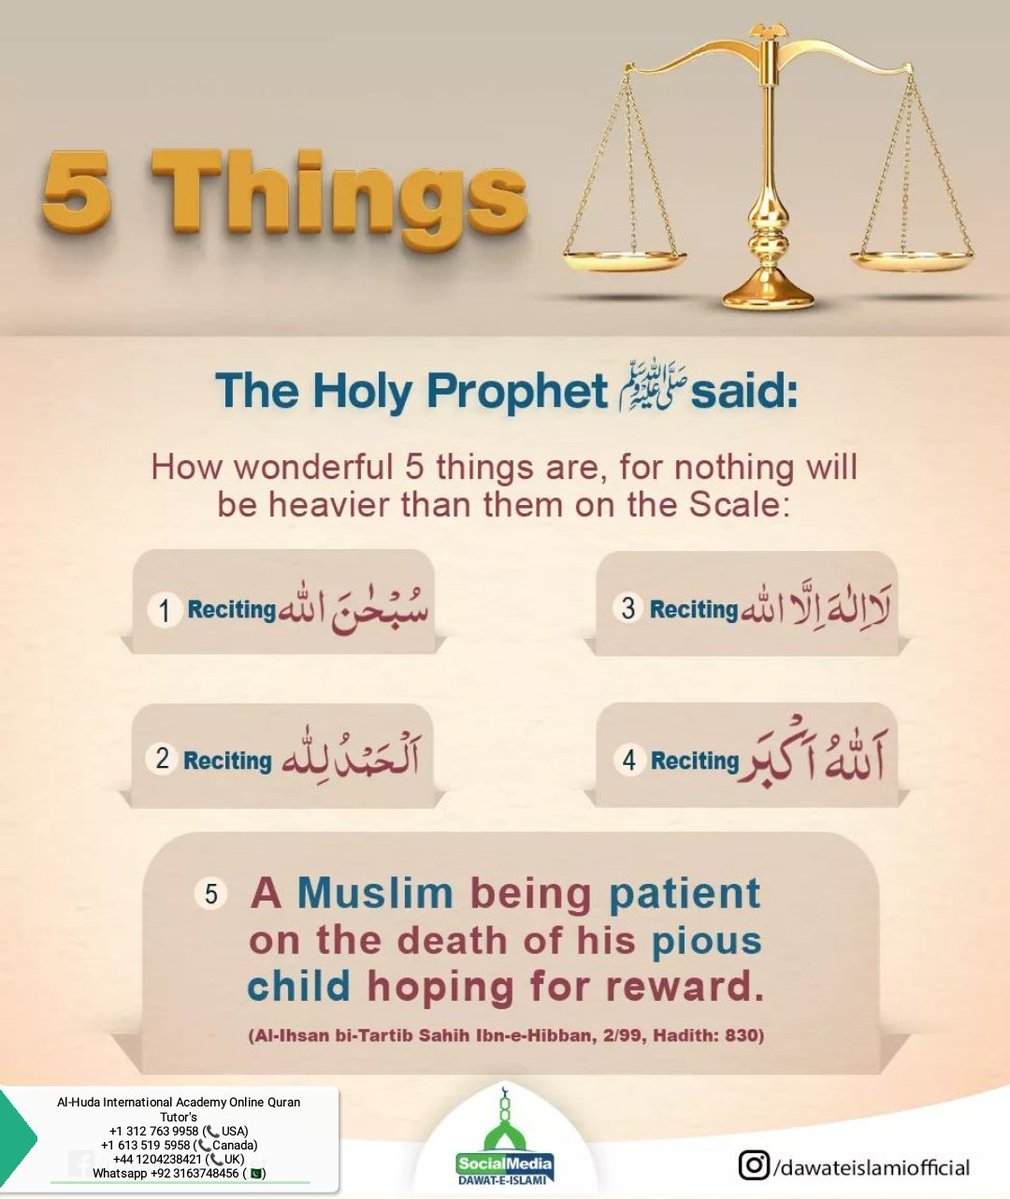 Al Huda International Academy on Twitter: